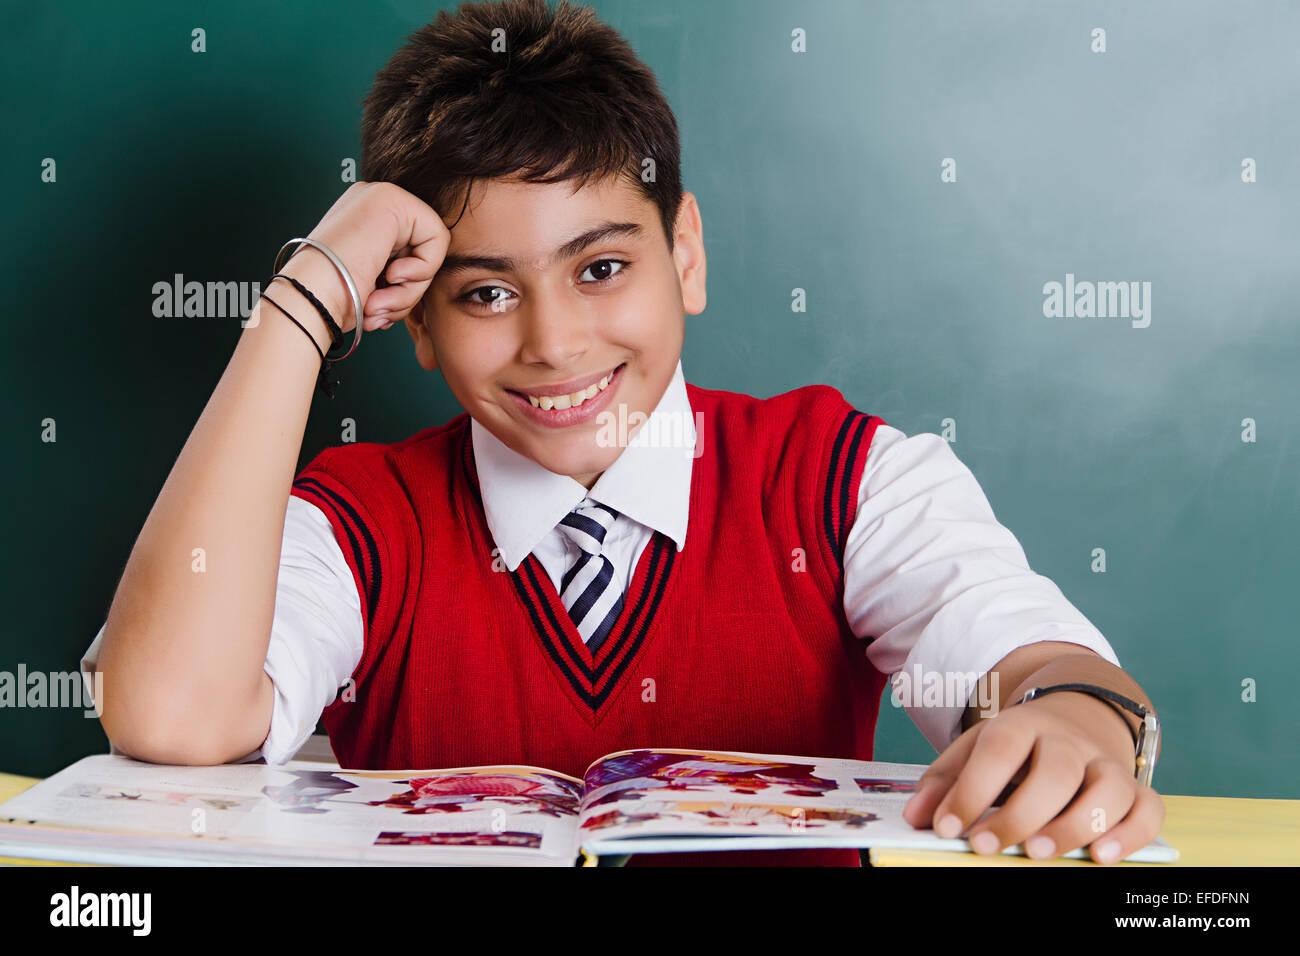 1 Indian School Boy Student Book Study Stock Photo